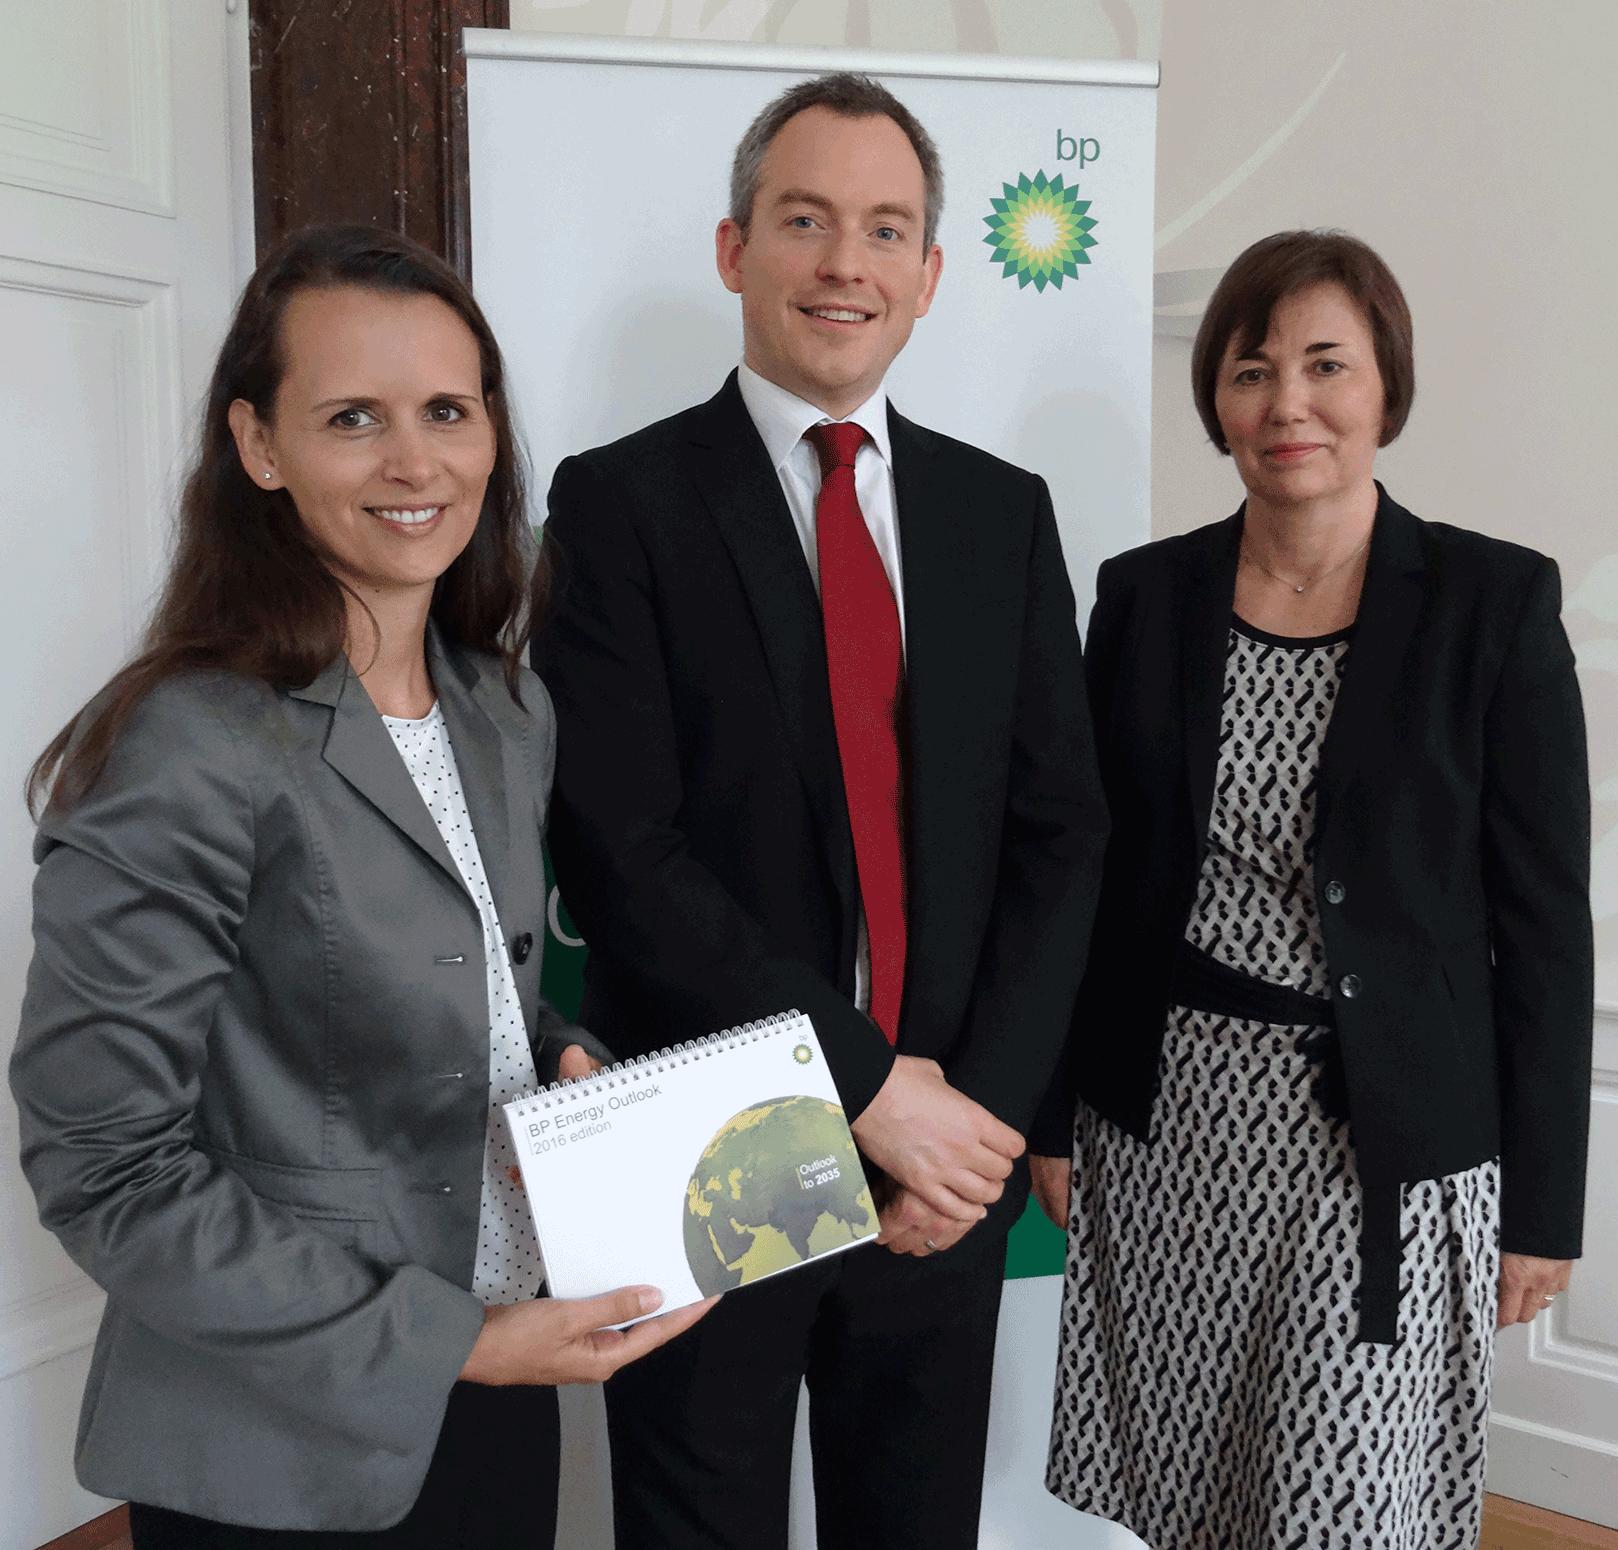 Präsentierten in Wien die 65. Ausgabe des BP Statistical Review of World Energy June 2016 und den BP Energy Outlook 2035 (vrnl): Gerlinde Hofer (BP Europa SE/BP Austria), Richard de Caux (BP p.l.c. London), Melanie Milchram-Pinter (BP Europa SE/BP Austria).